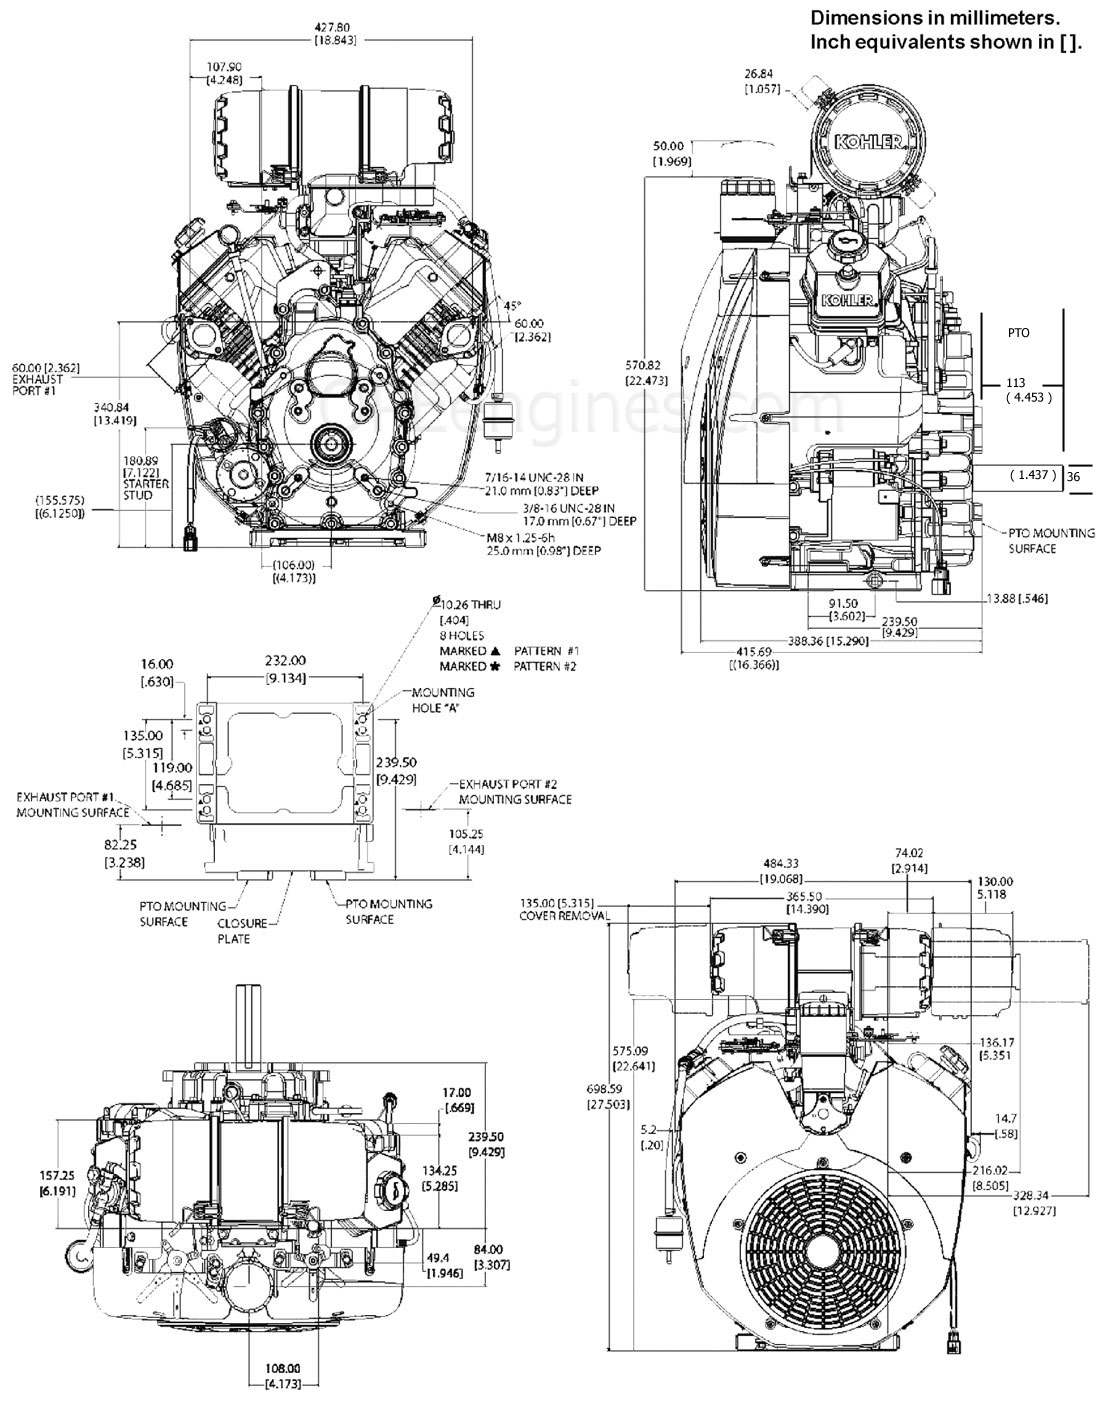 CH980_drawings?resize=680%2C878&ssl=1 25 hp kohler wiring diagram kohler command 25 hp diagram, kohler kohler motor wiring diagram at readyjetset.co